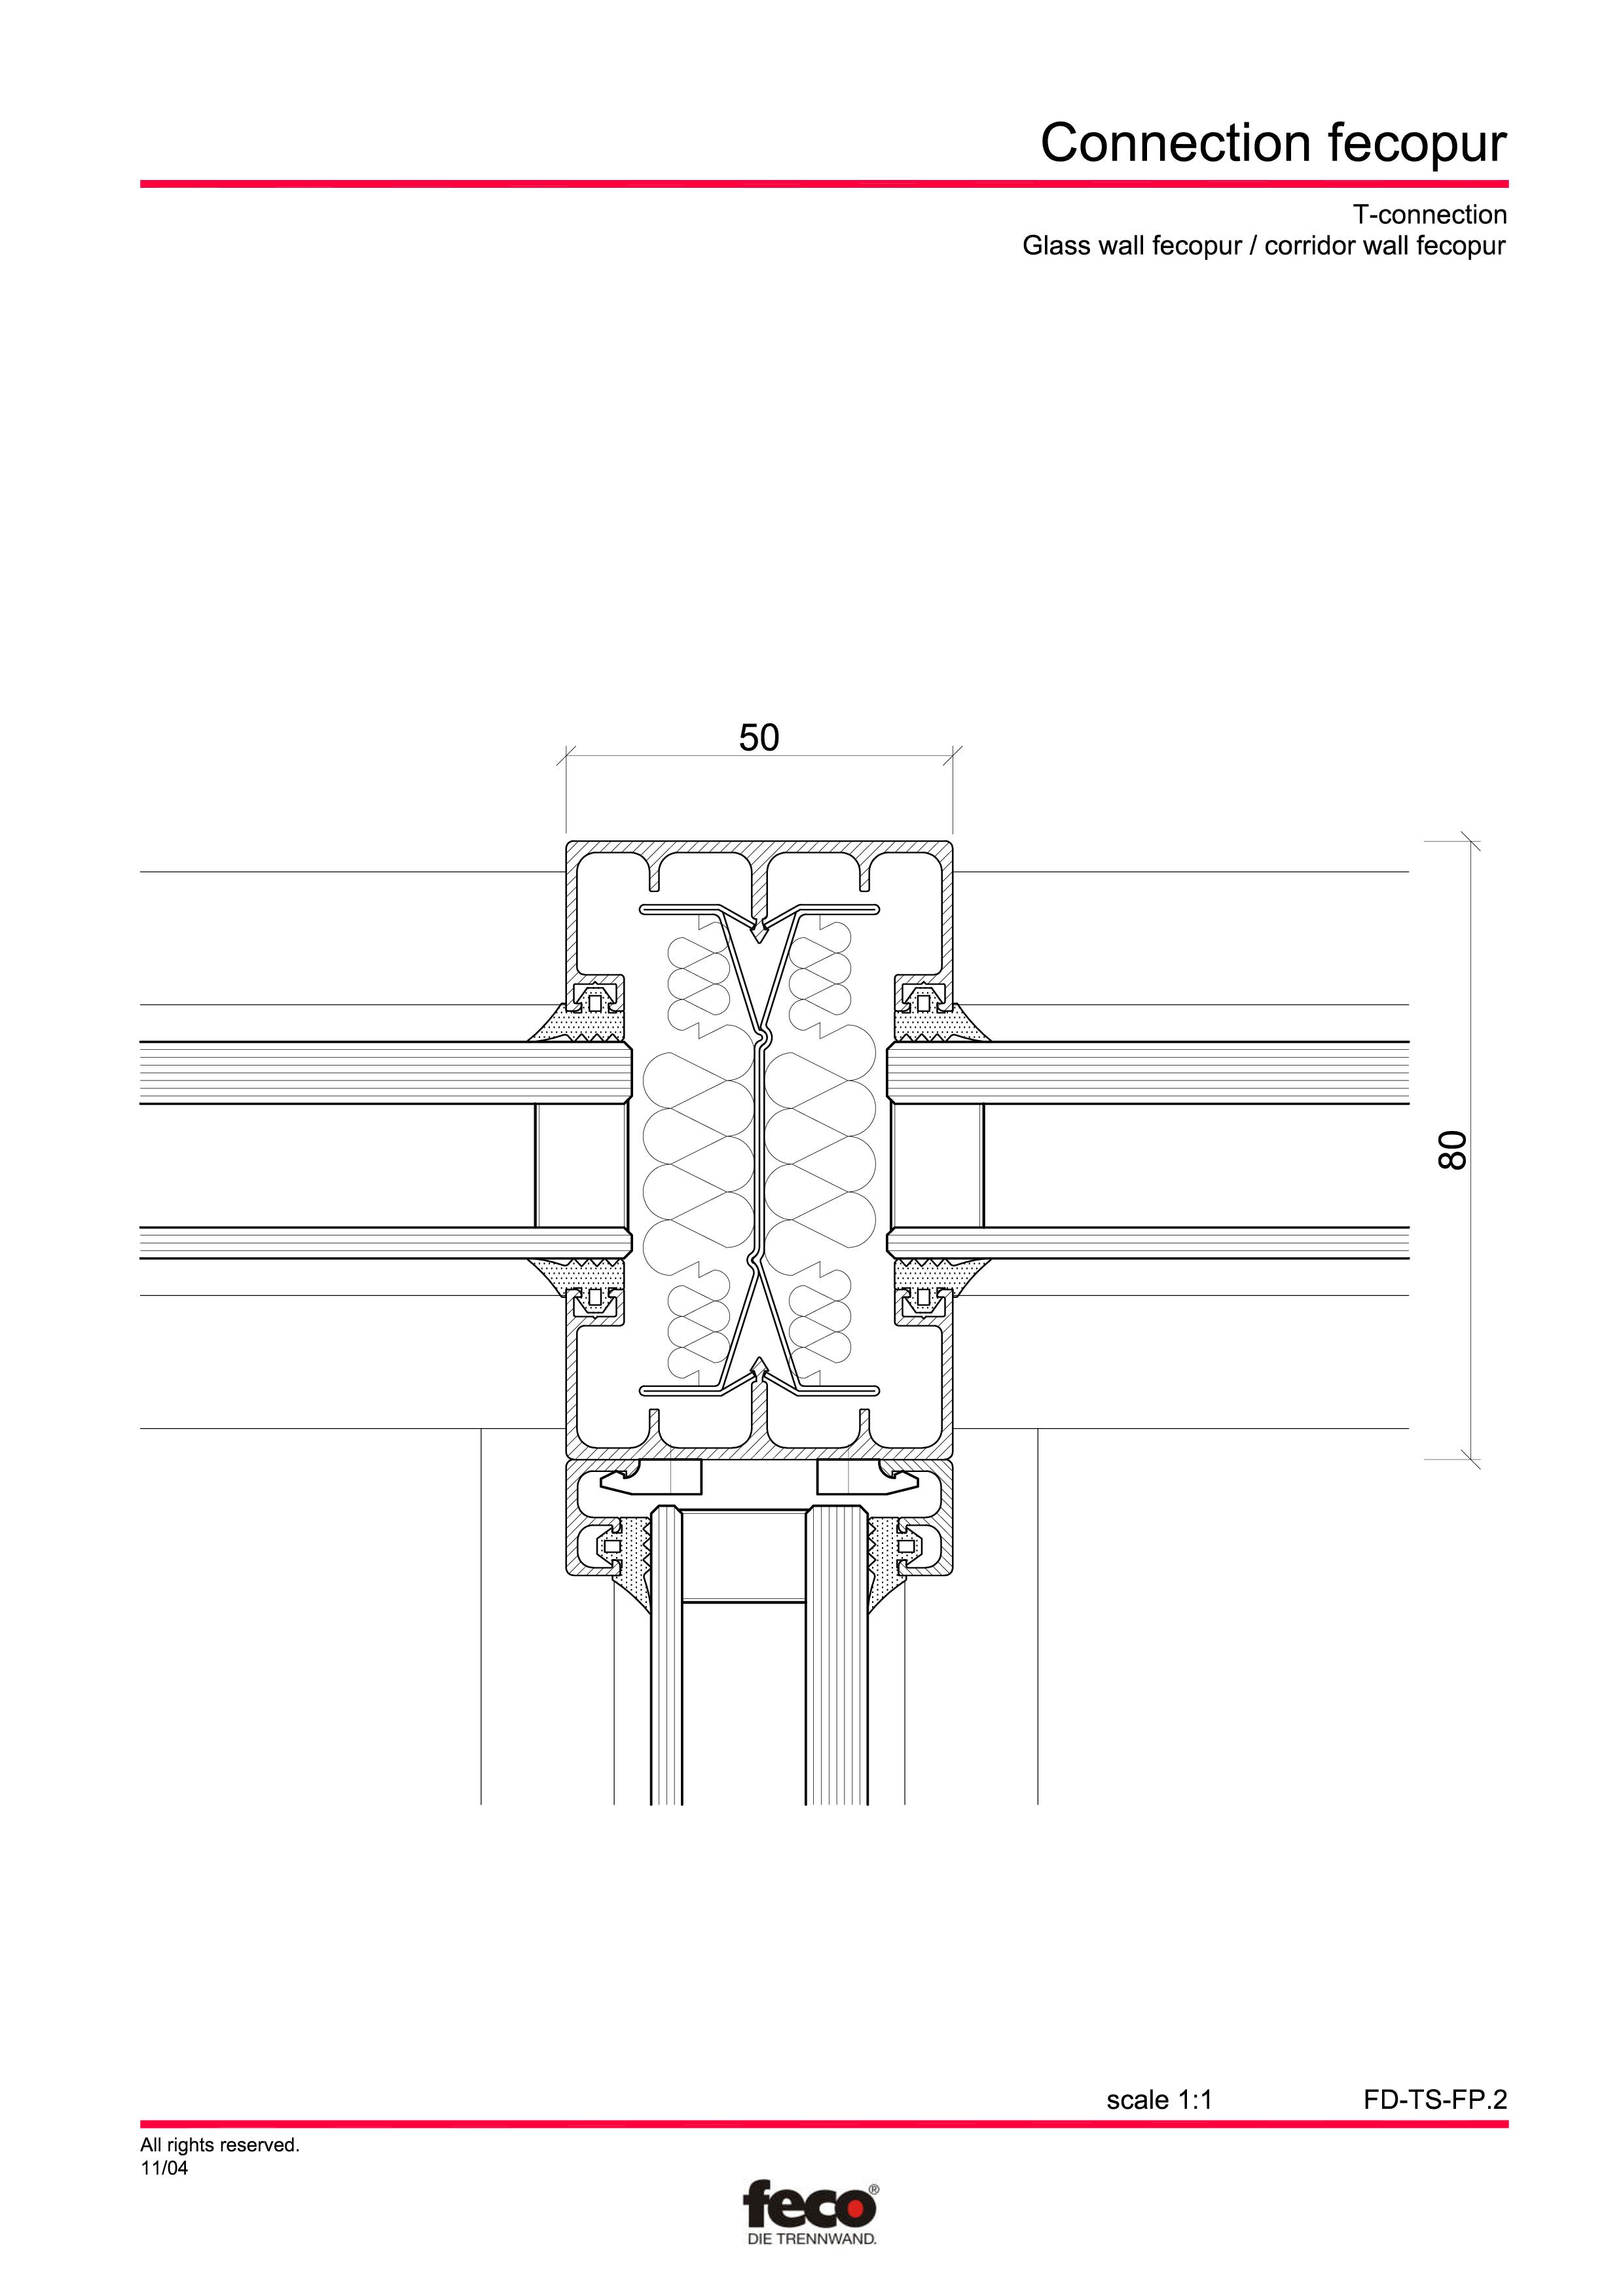 Pagina 4 - CAD-PDF Detaliu racord pereti FECO Detaliu de montaj FecoPur, FecoFix, FecoLux